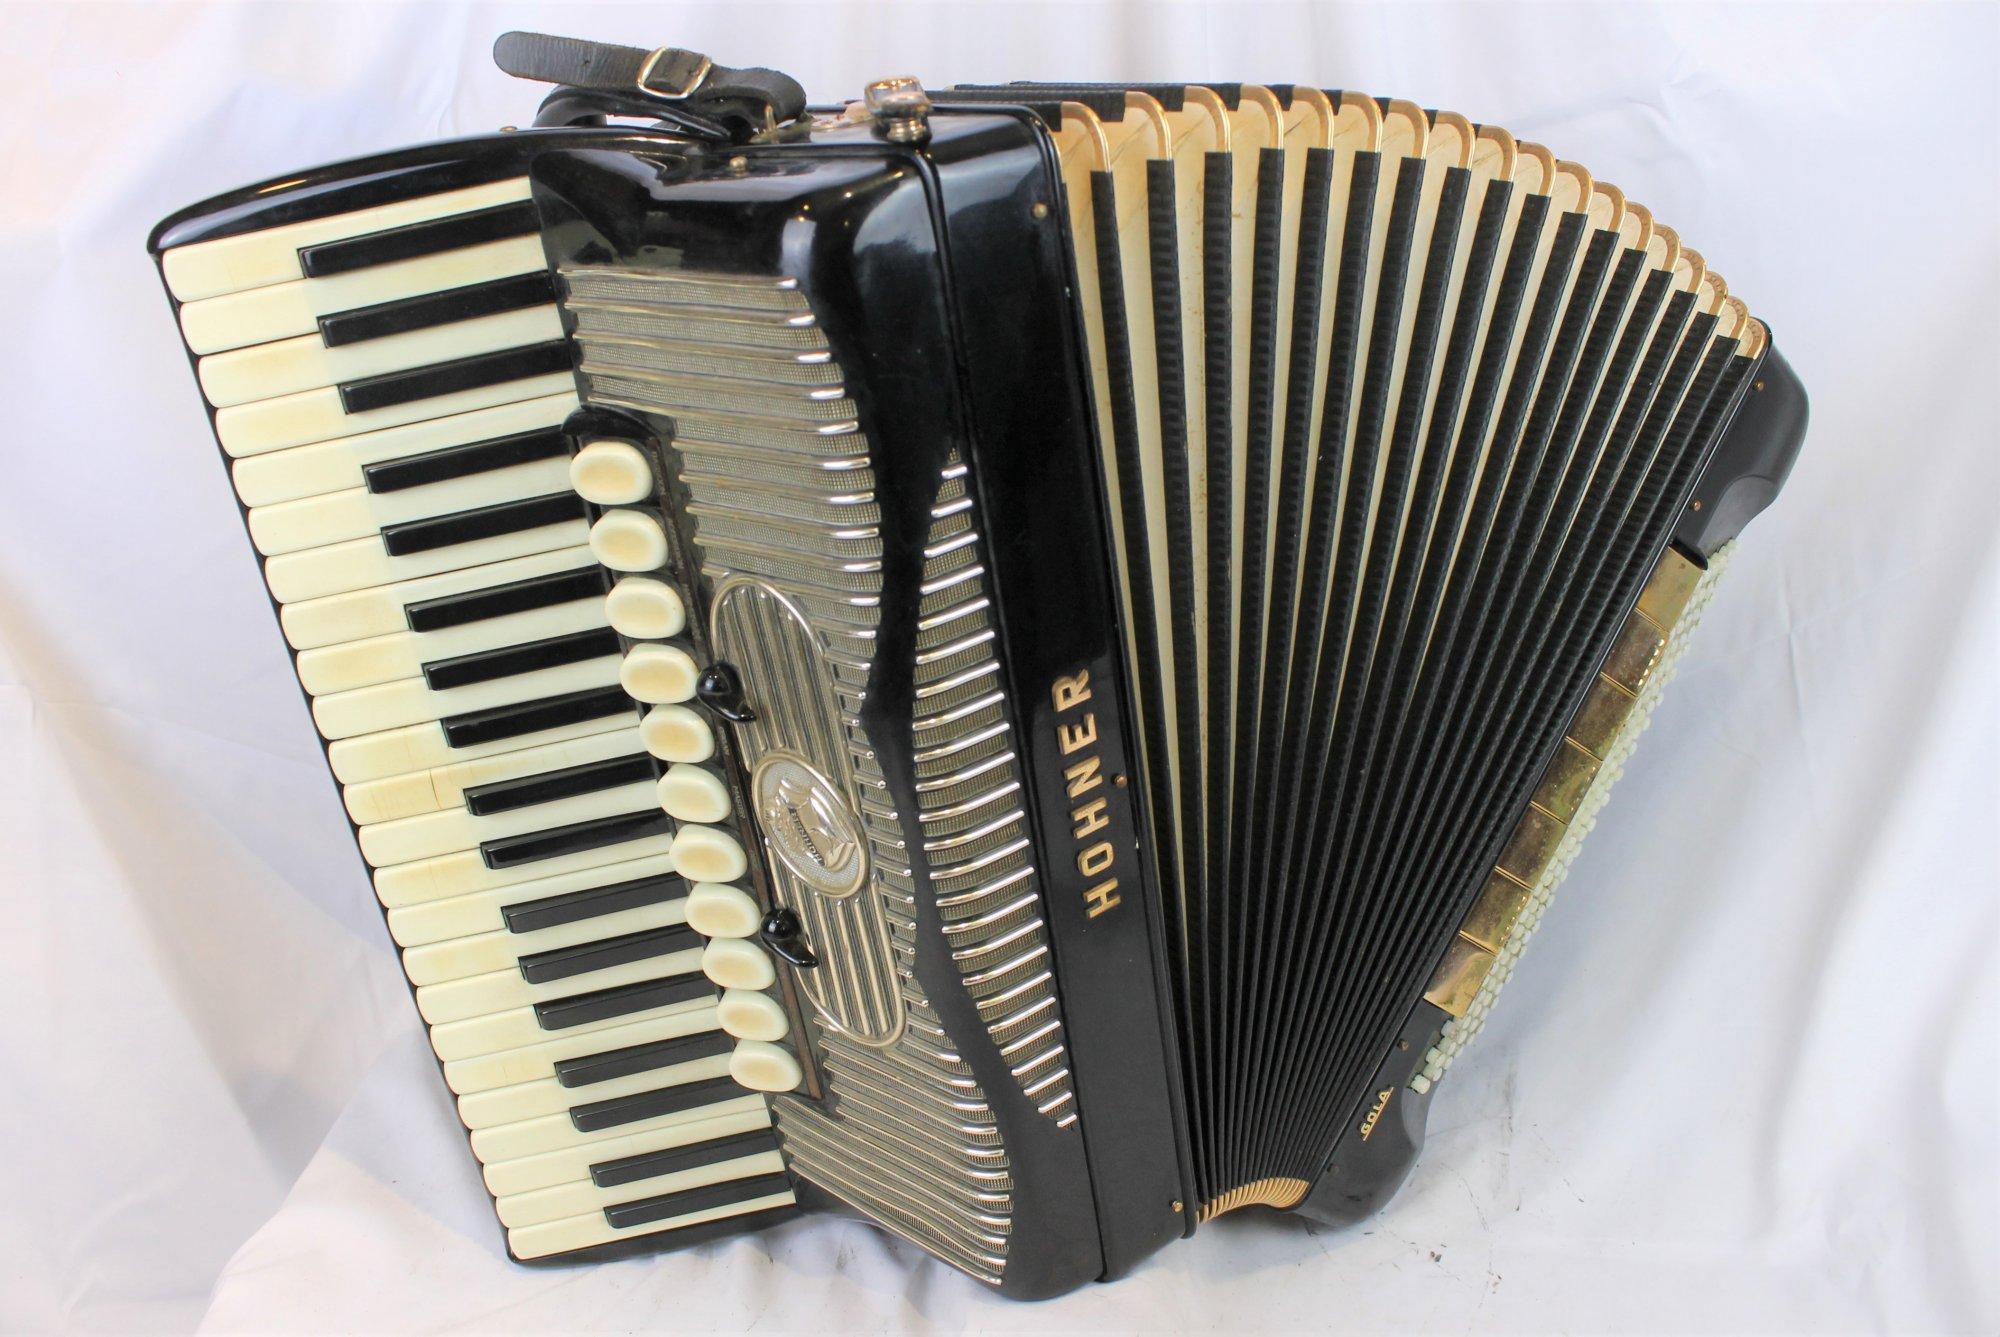 4027 - Black Hohner Gola Piano Accordion LMMM 41 120